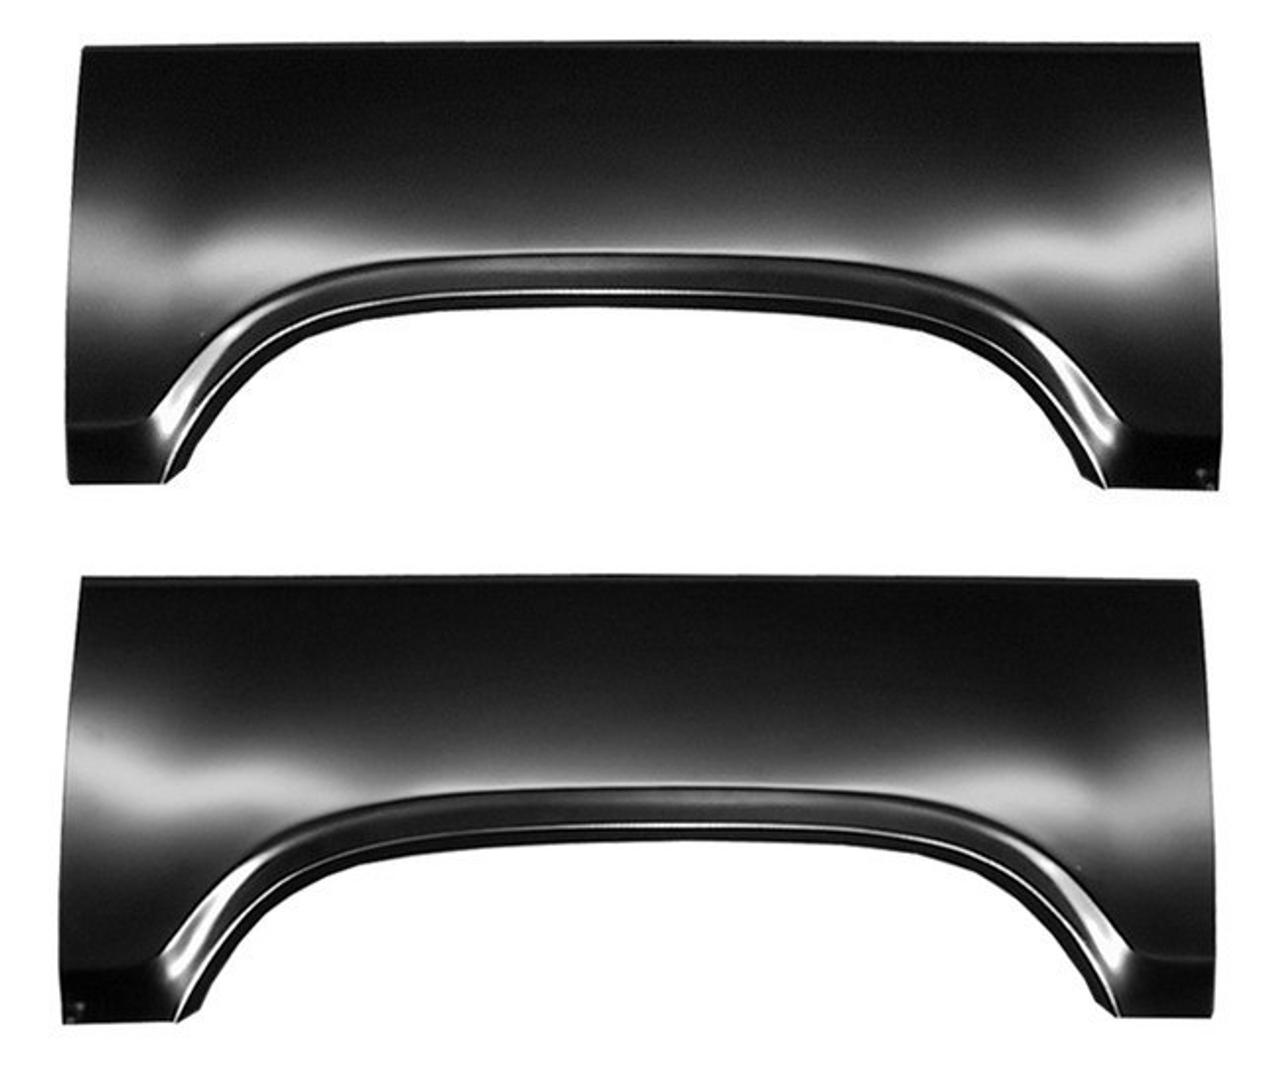 1981-1993 Dodge Ram Rear Upper Wheelarch Repair Panels (Sold As A Pair)